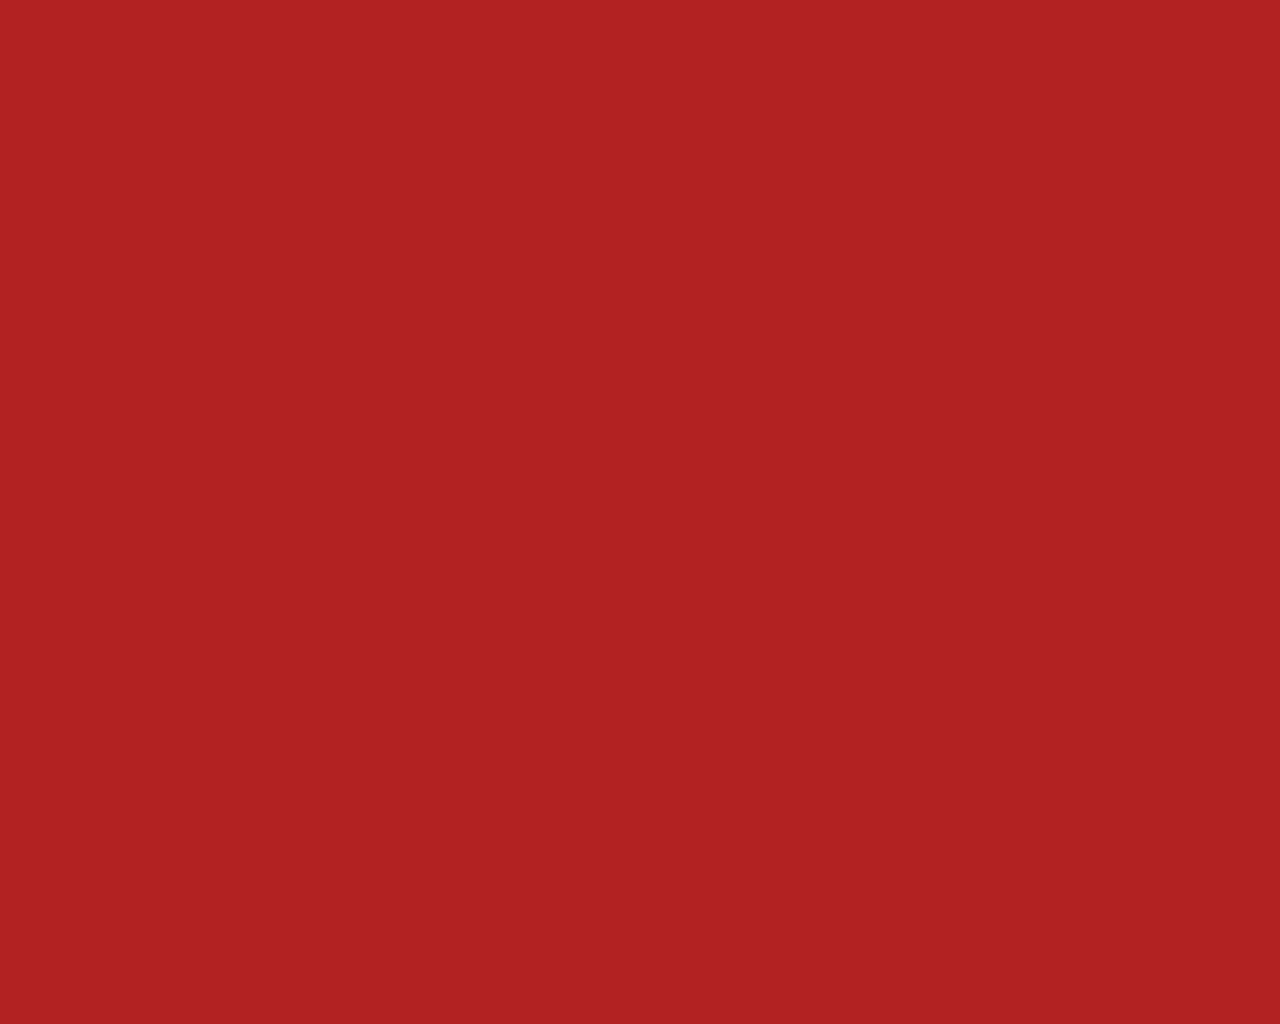 1280x1024 Firebrick Solid Color Background